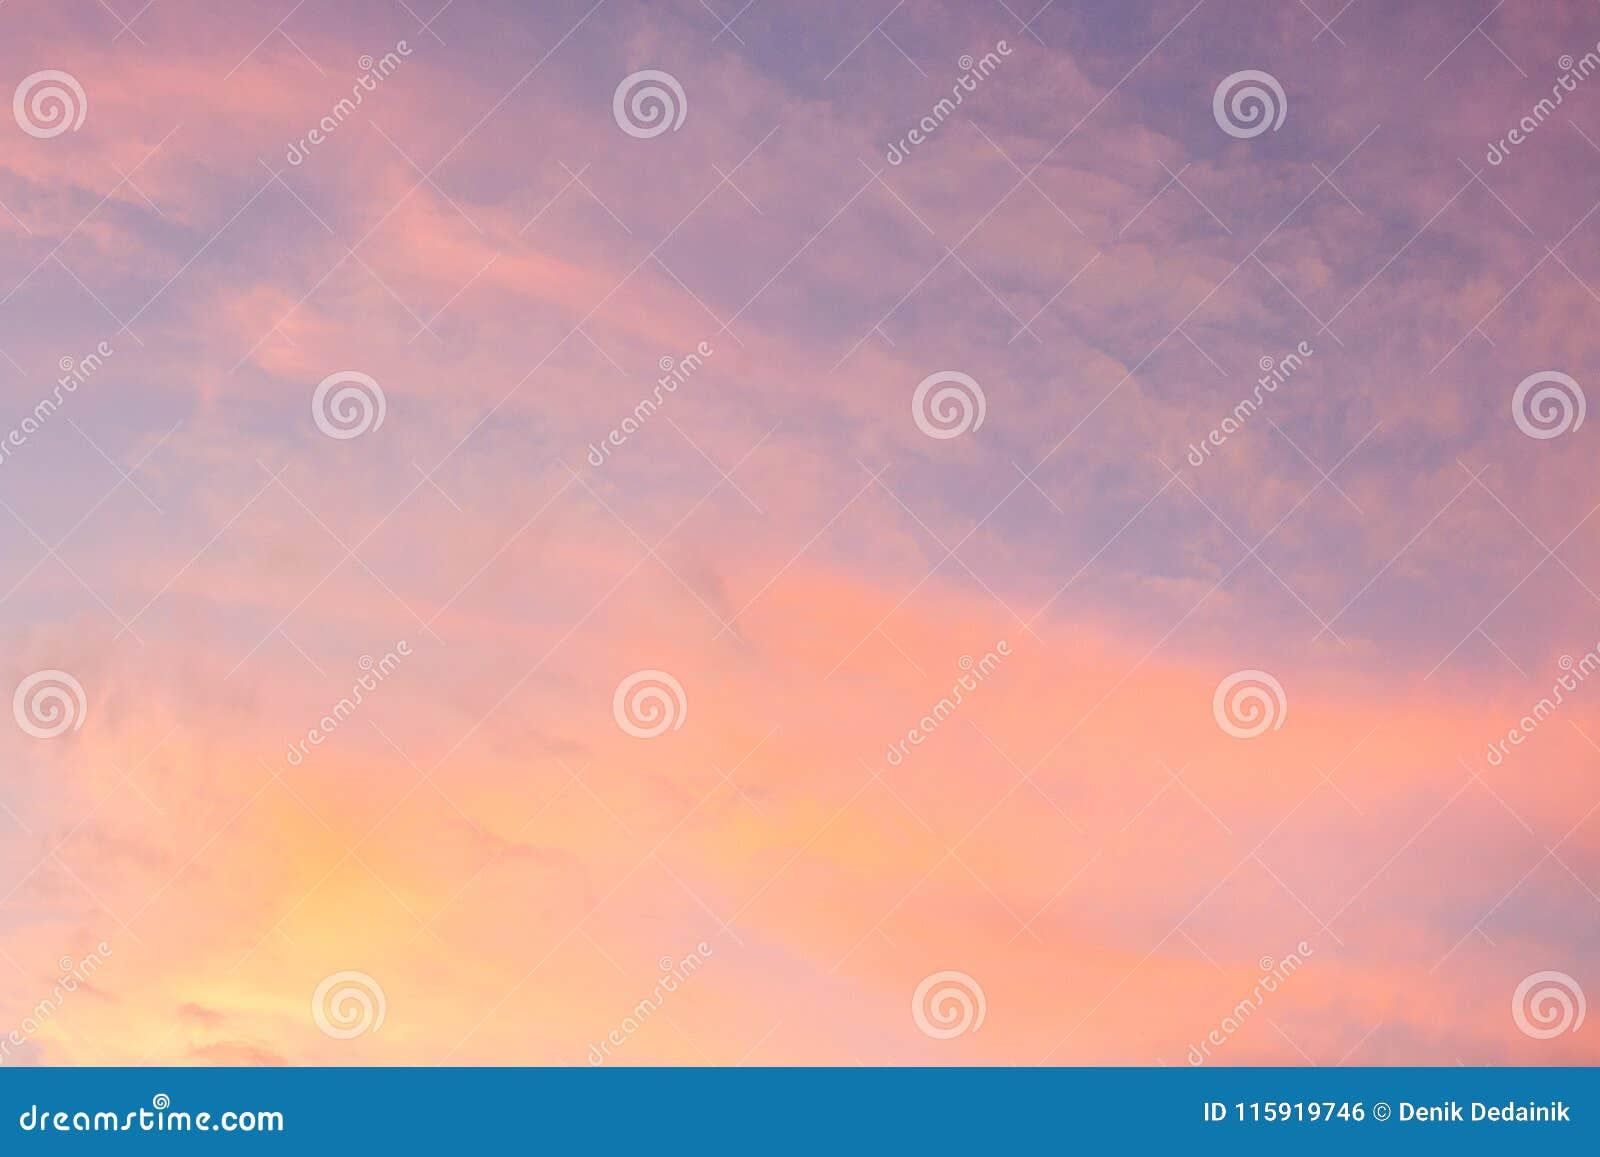 Serenity Sky Stock Photo Image Of Purple Blue Cloud 115919746